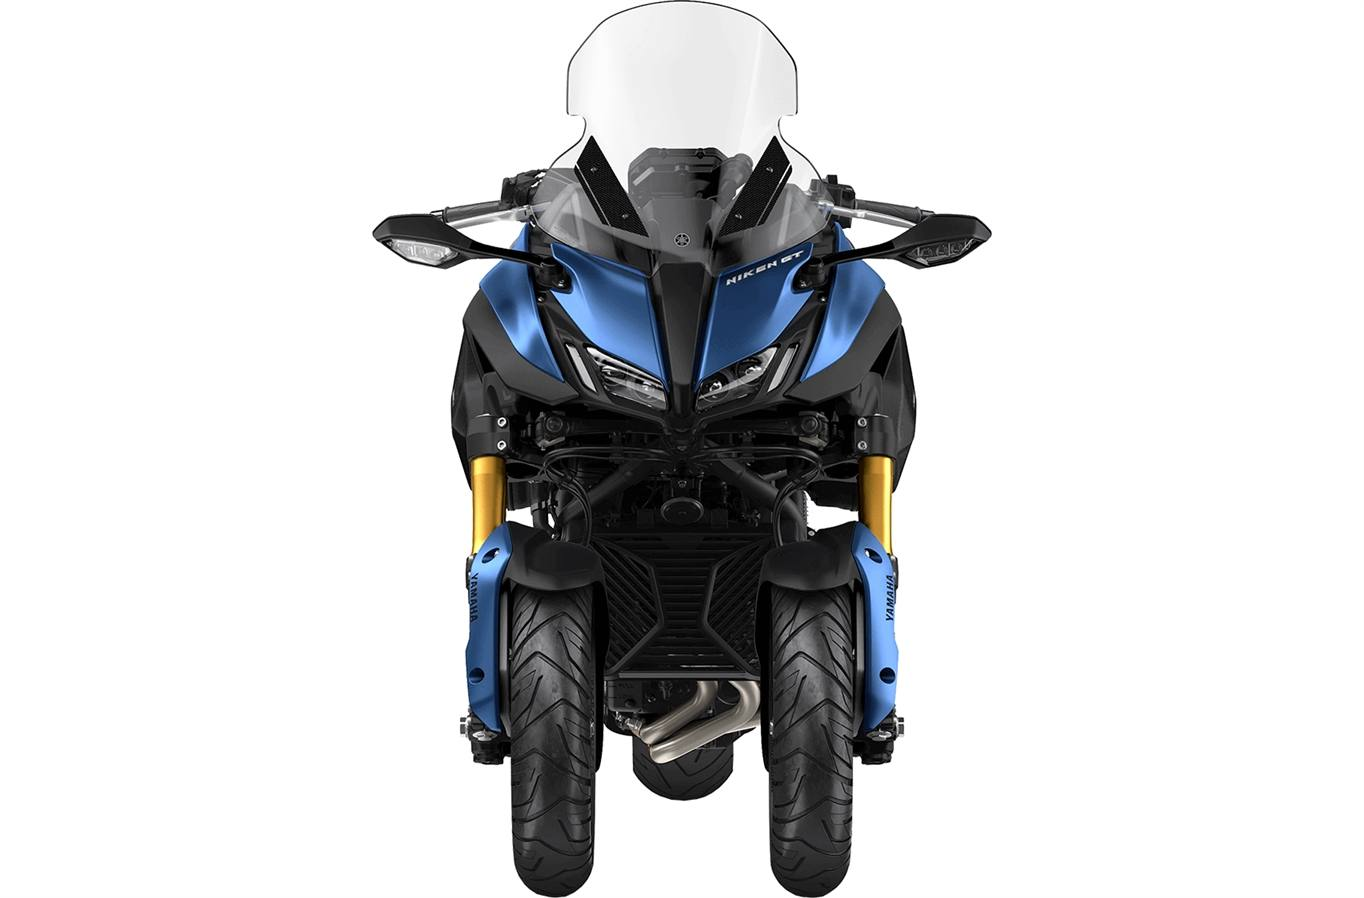 2019 Yamaha Niken Gt For Sale In Saskatoon Sk Proline Motorsports